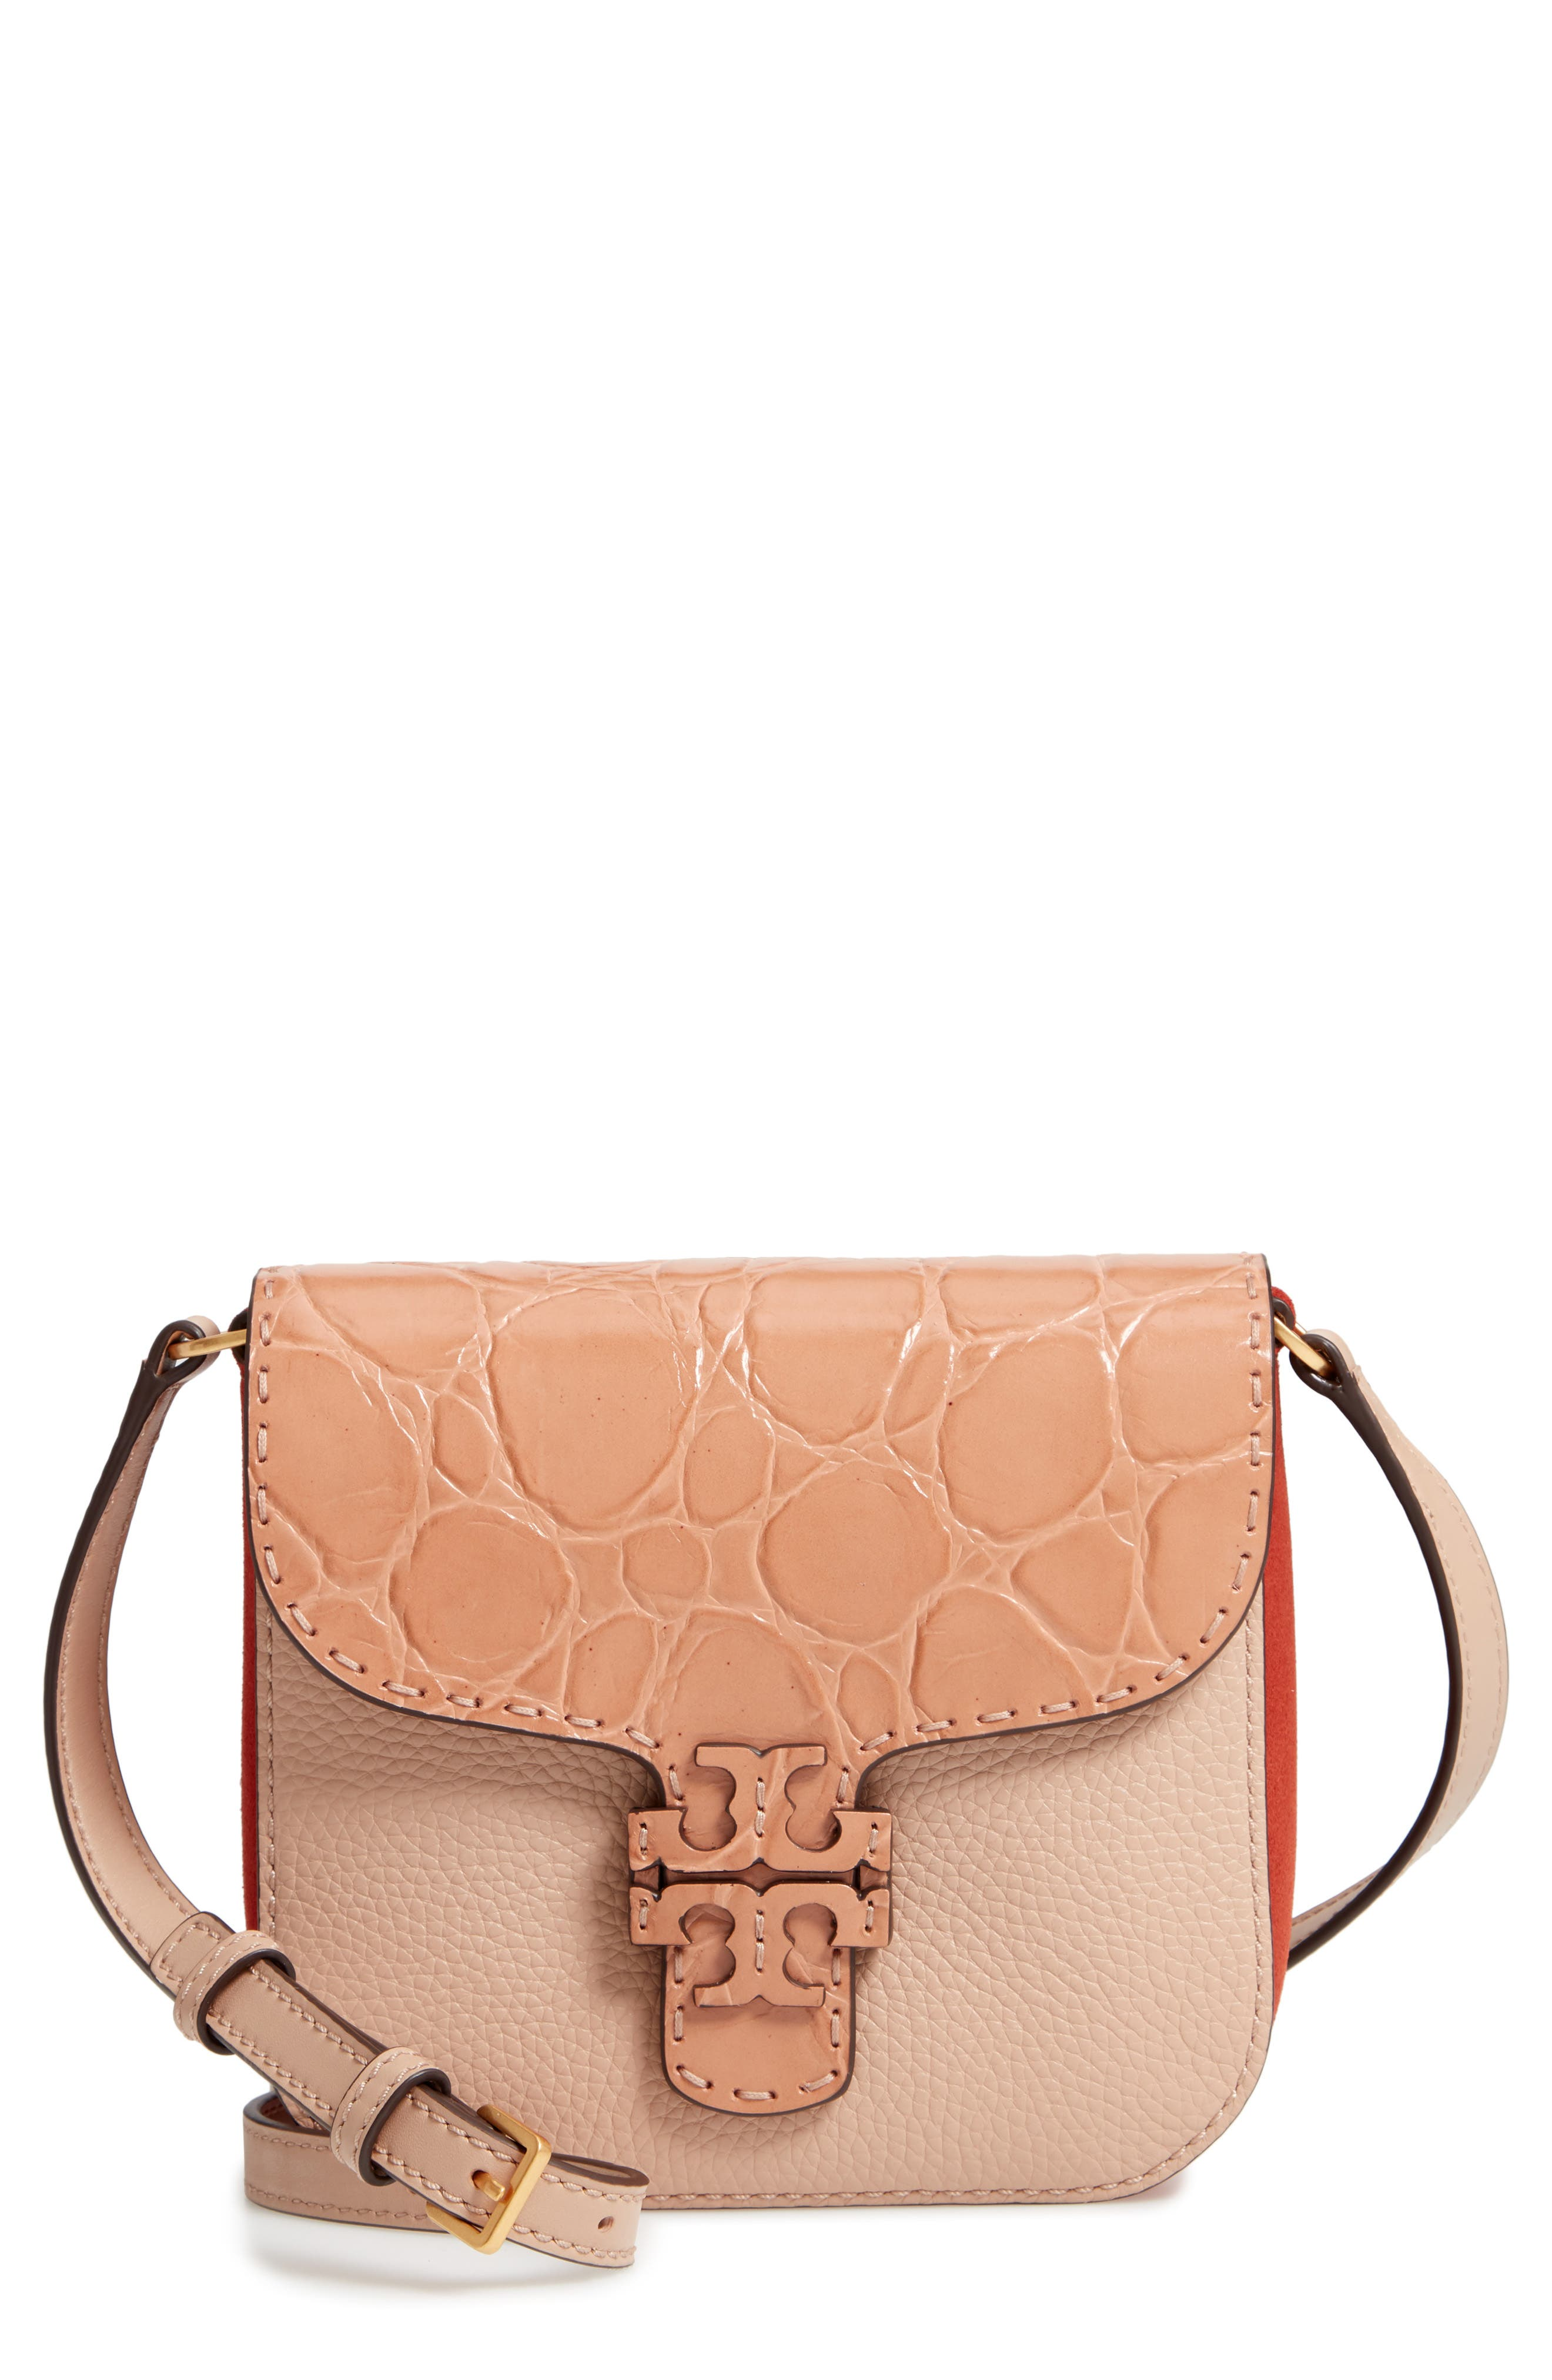 McGraw Croc Embossed Leather Crossbody Bag,                         Main,                         color, 200